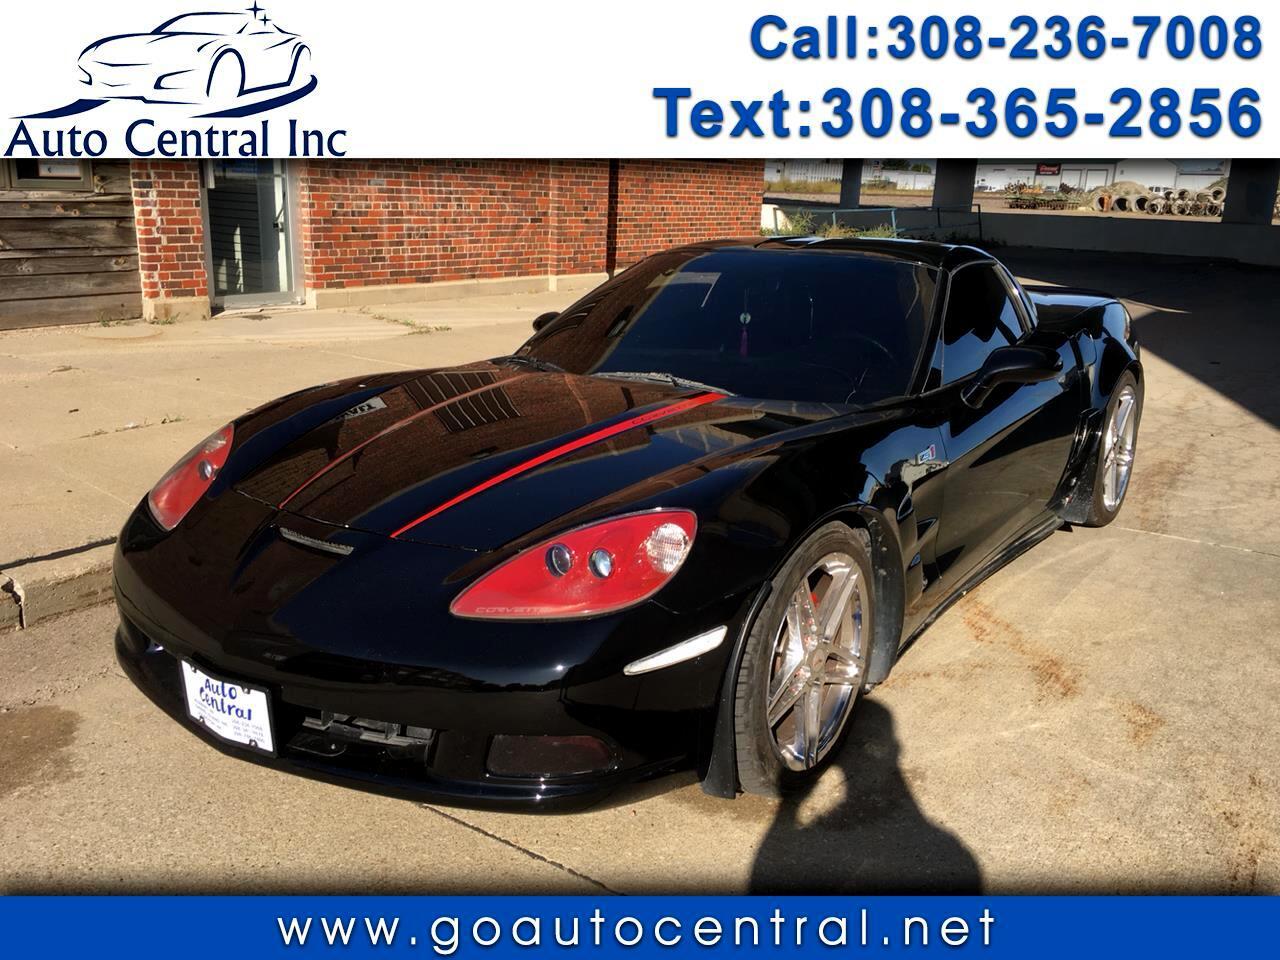 2007 Chevrolet Corvette 2dr Cpe